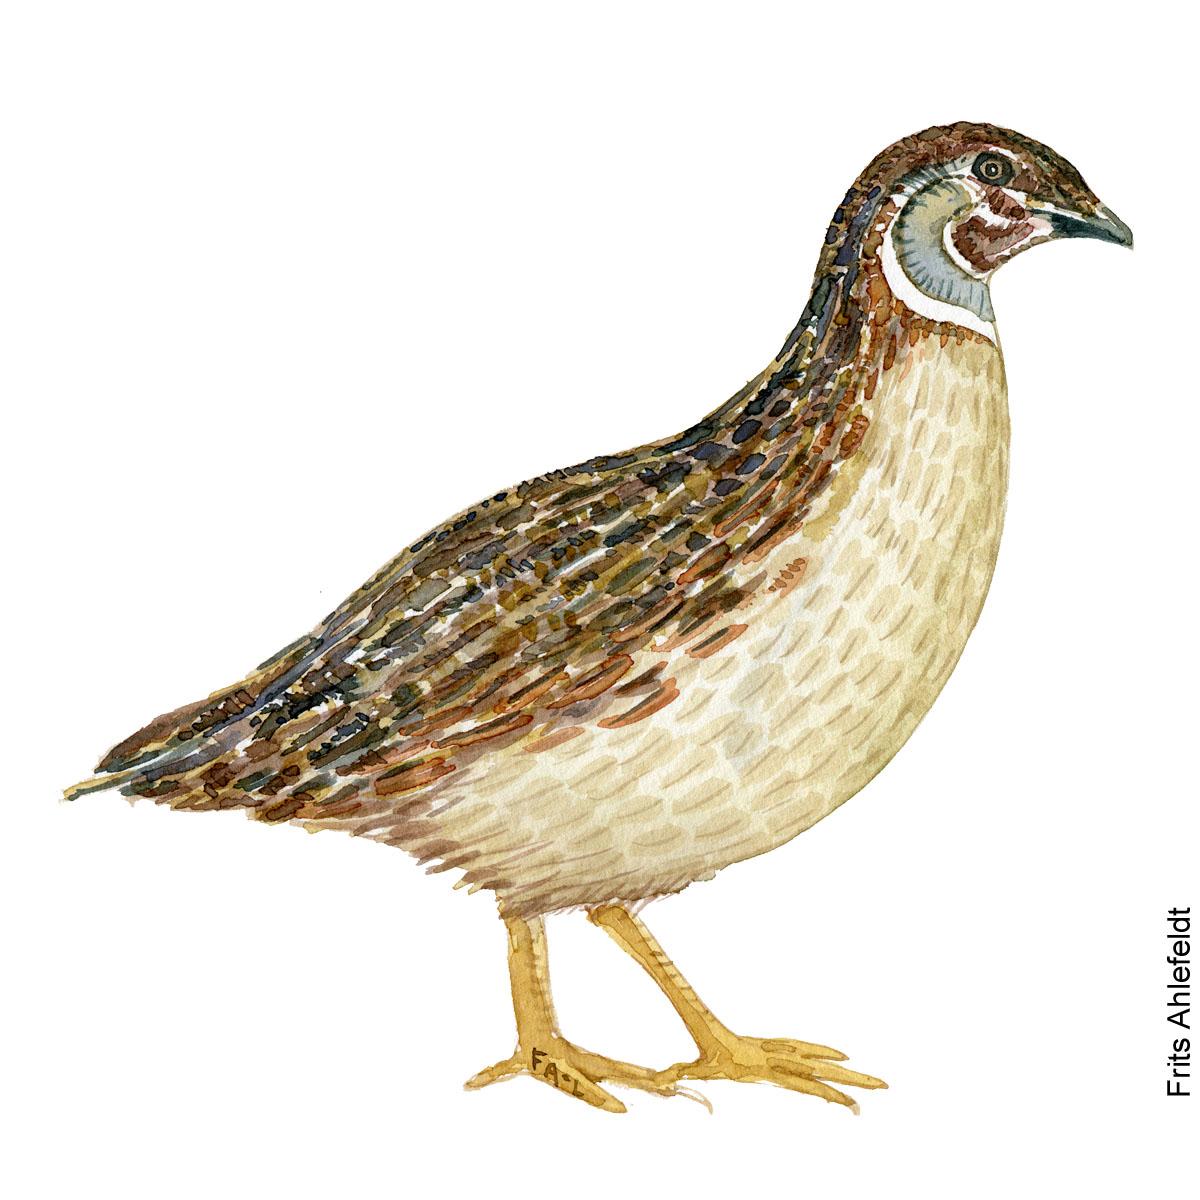 Vagtel - Common quail bird watercolor. Akvarel af Frits Ahlefeldt